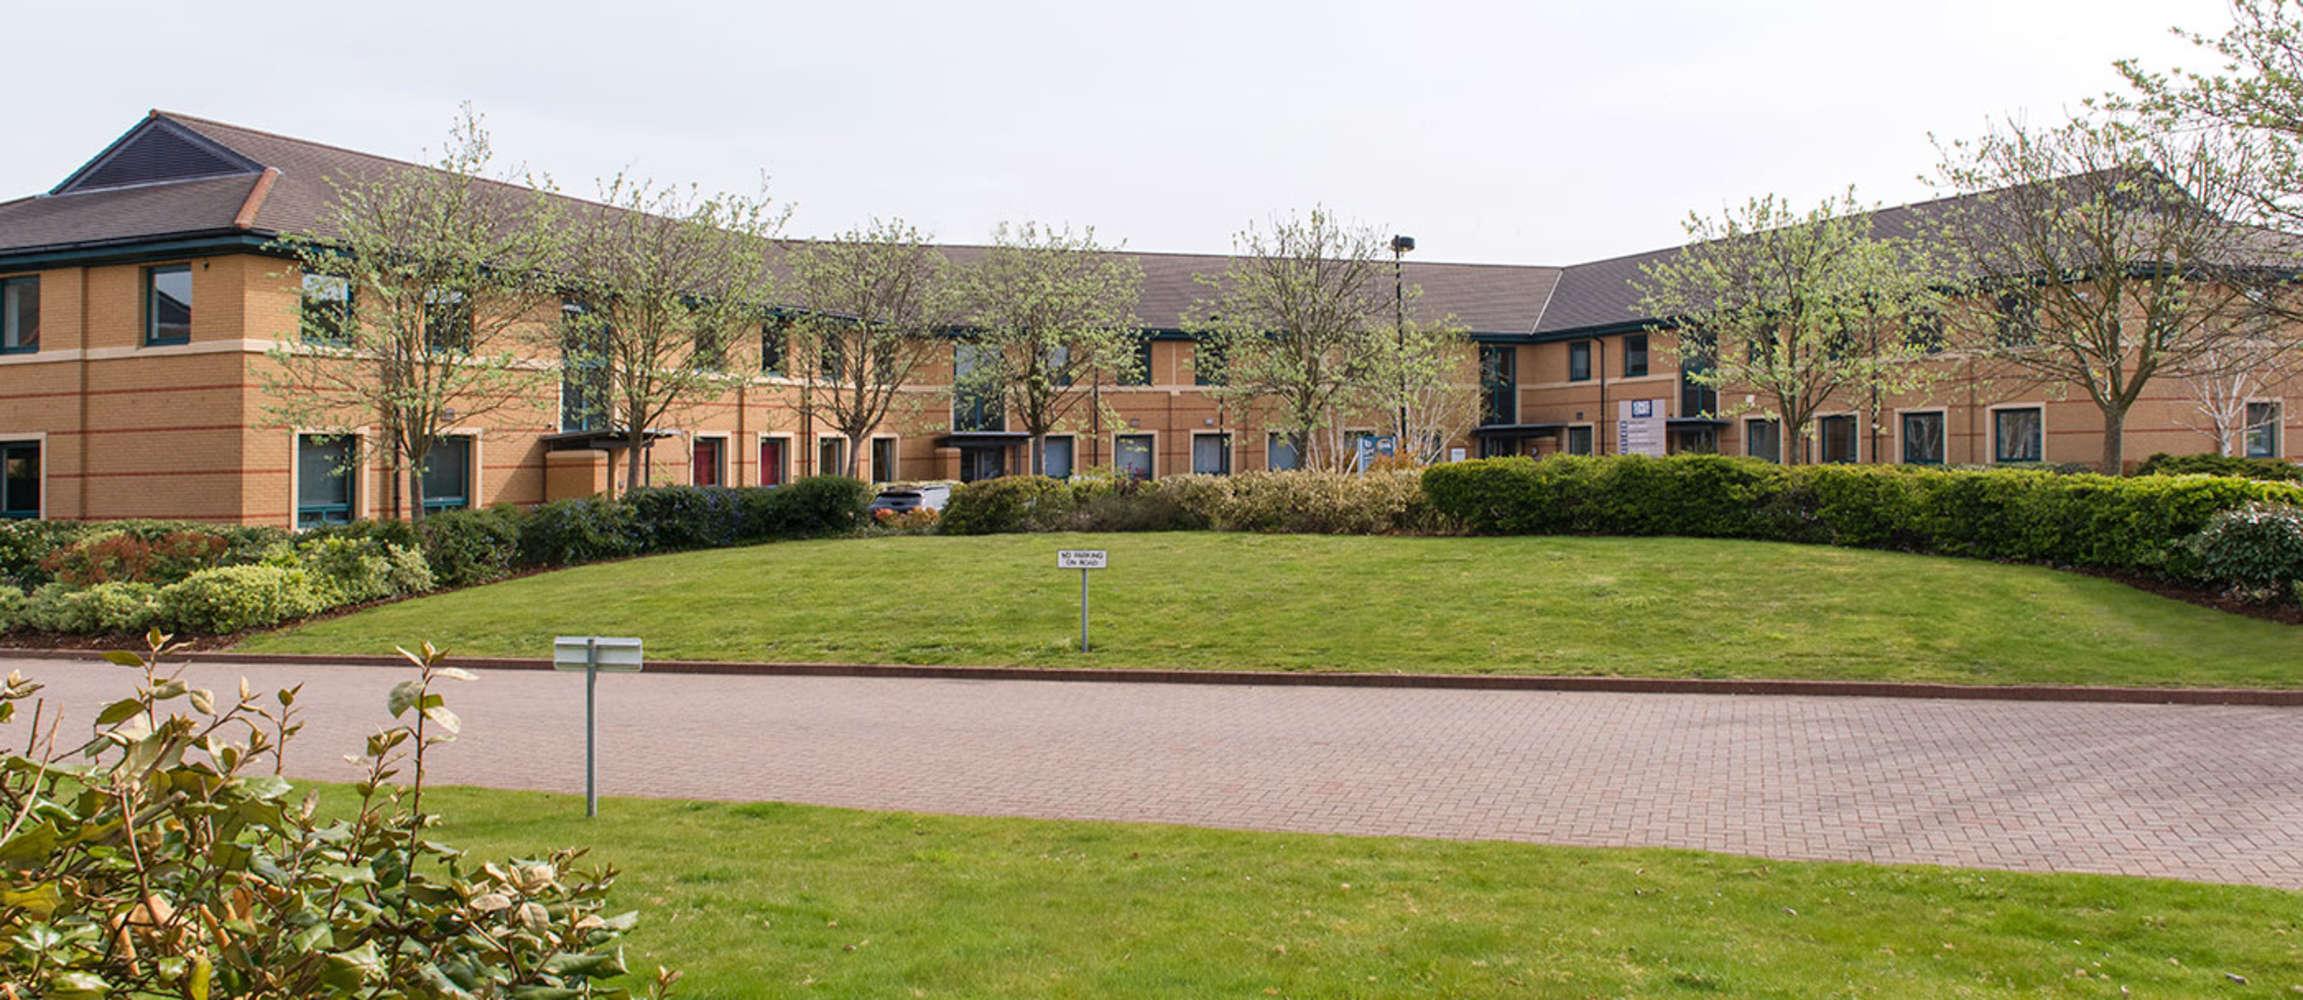 Office Birmingham, B37 7YE - 2675 Kings Court, Birmingham Business Park - 1